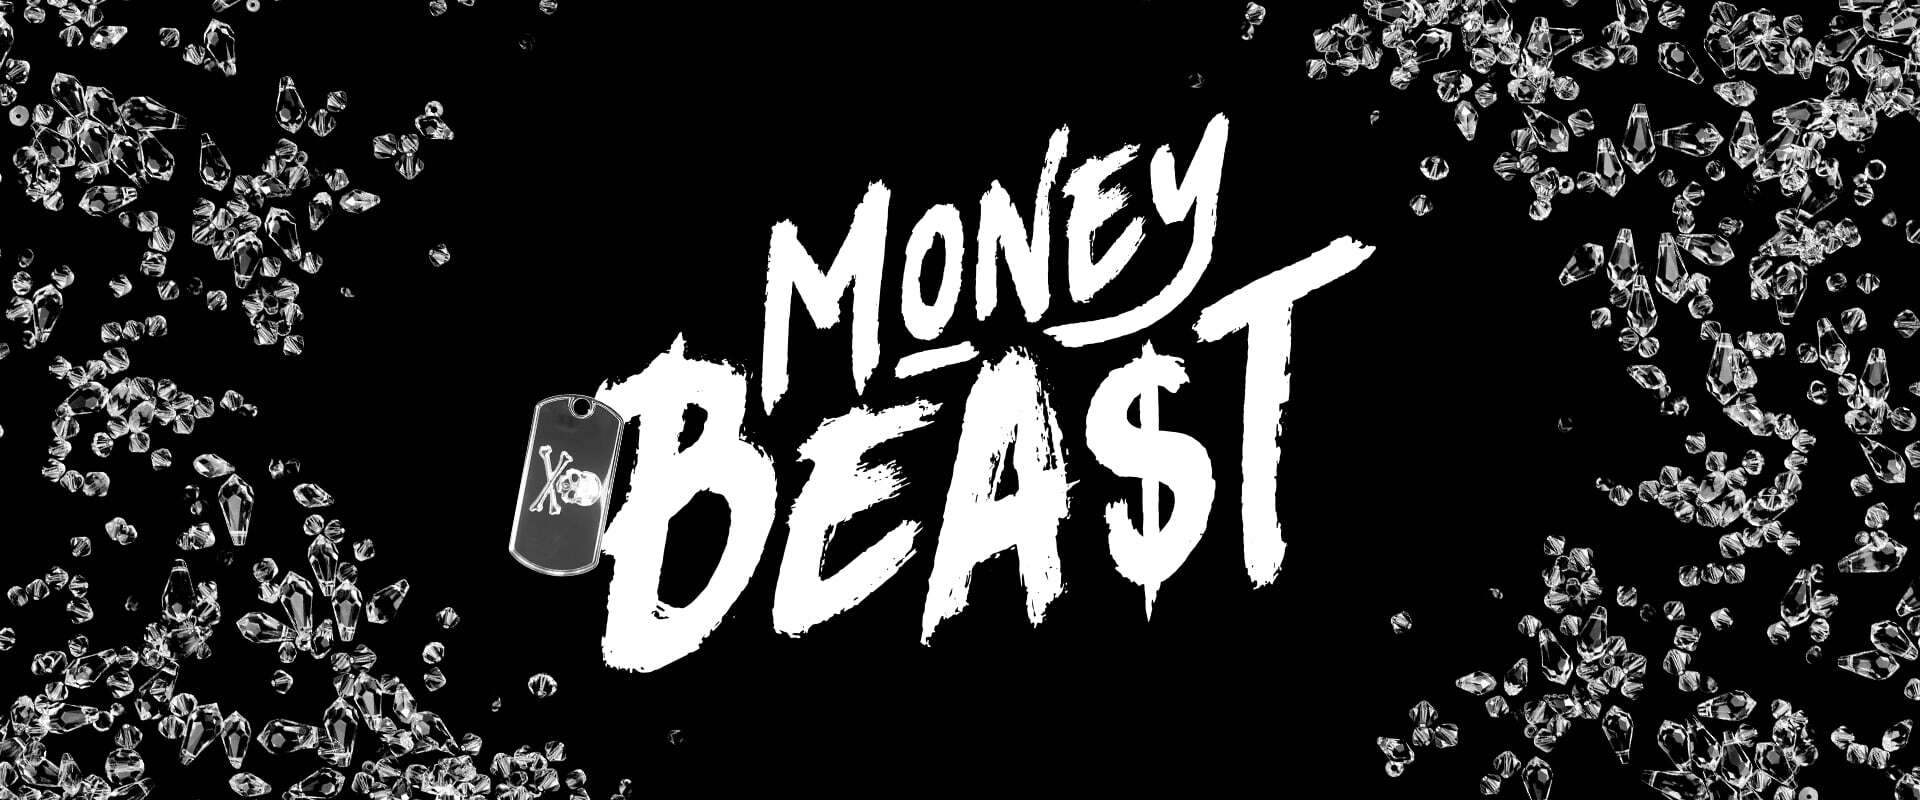 MONEYBEA$T